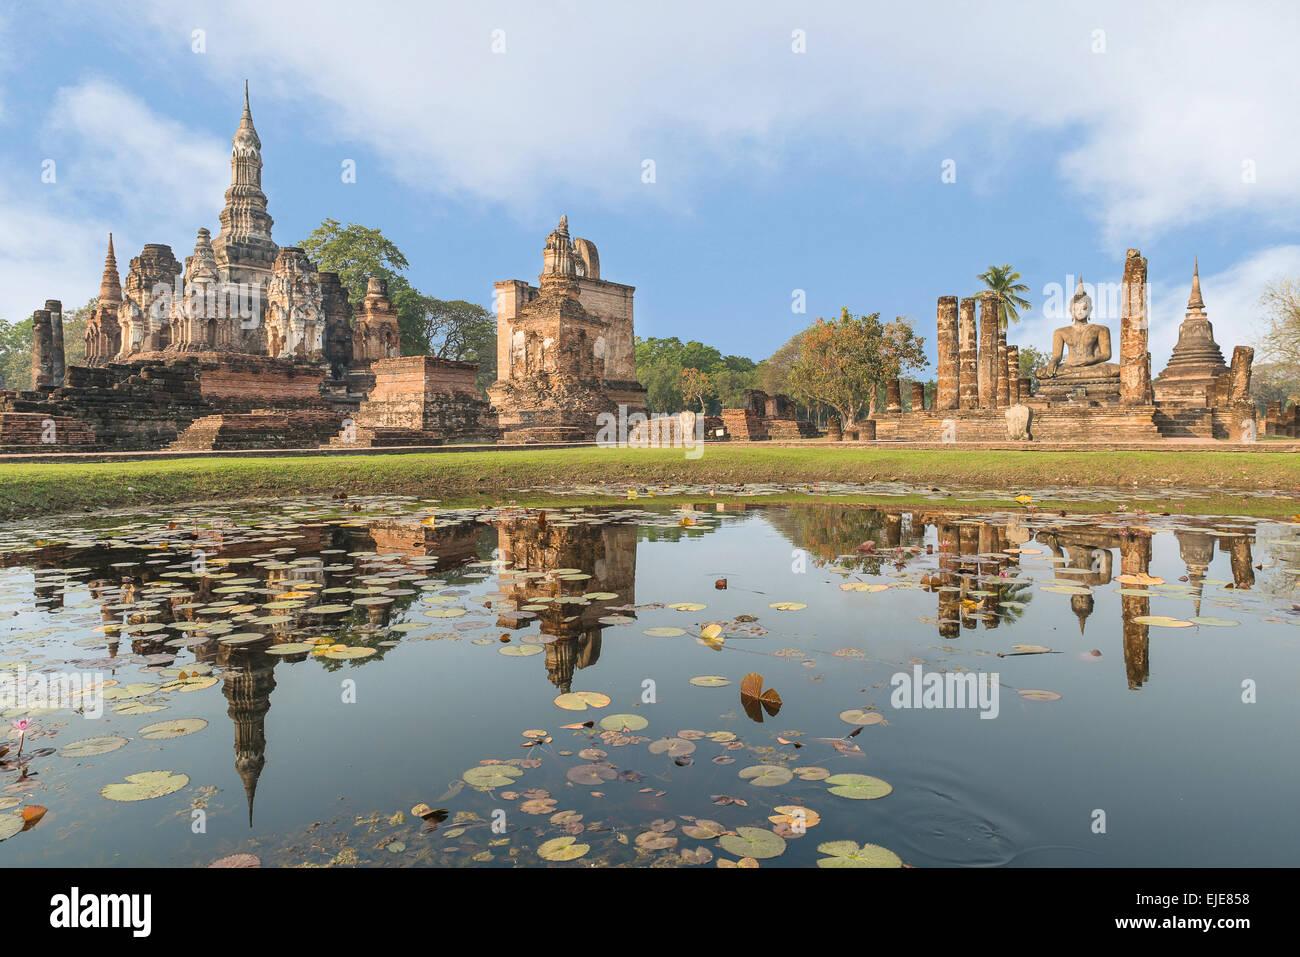 Sukhothai historical park in Thailand - Stock Image